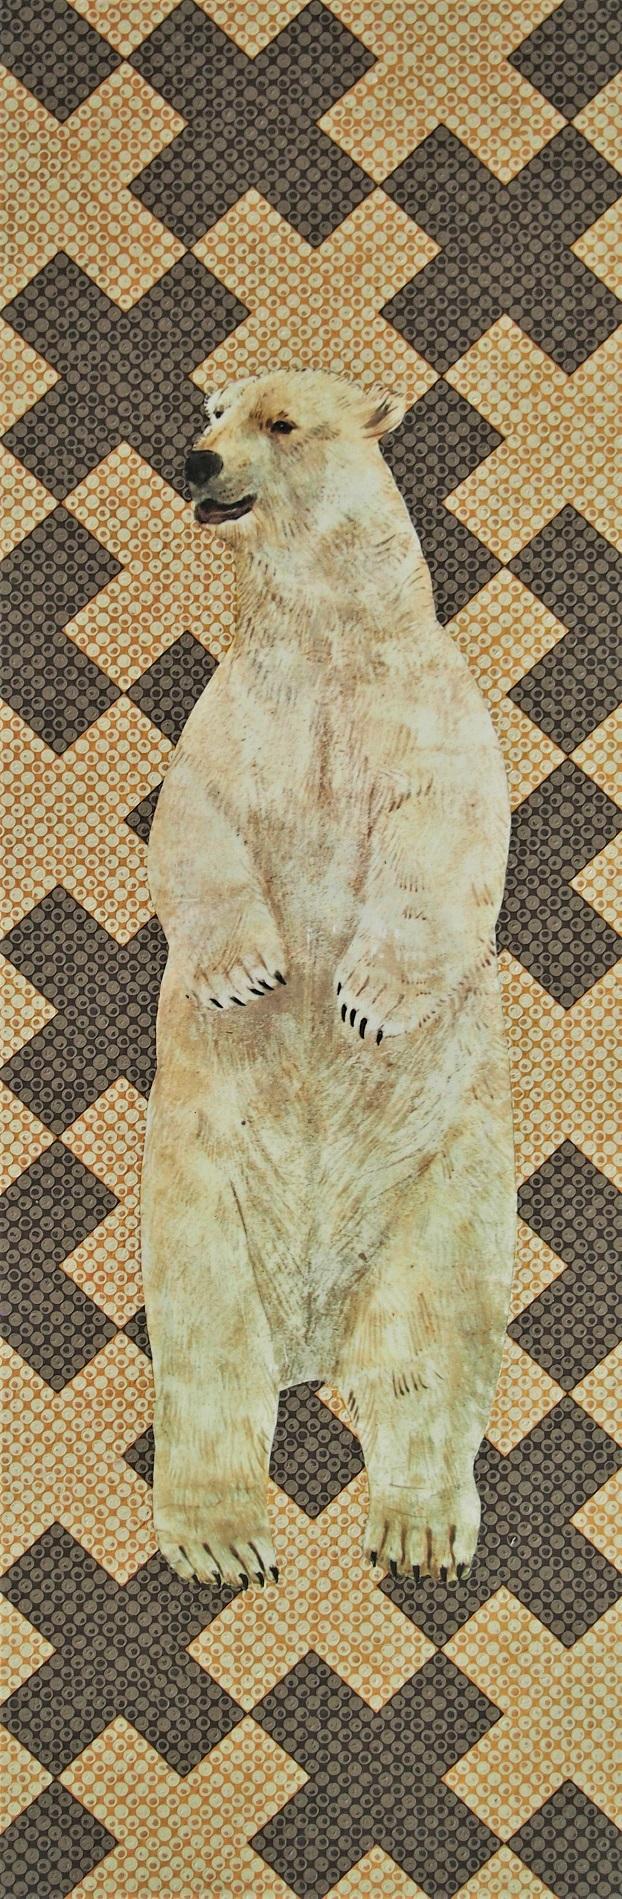 Polar Bear 15x45cm £300